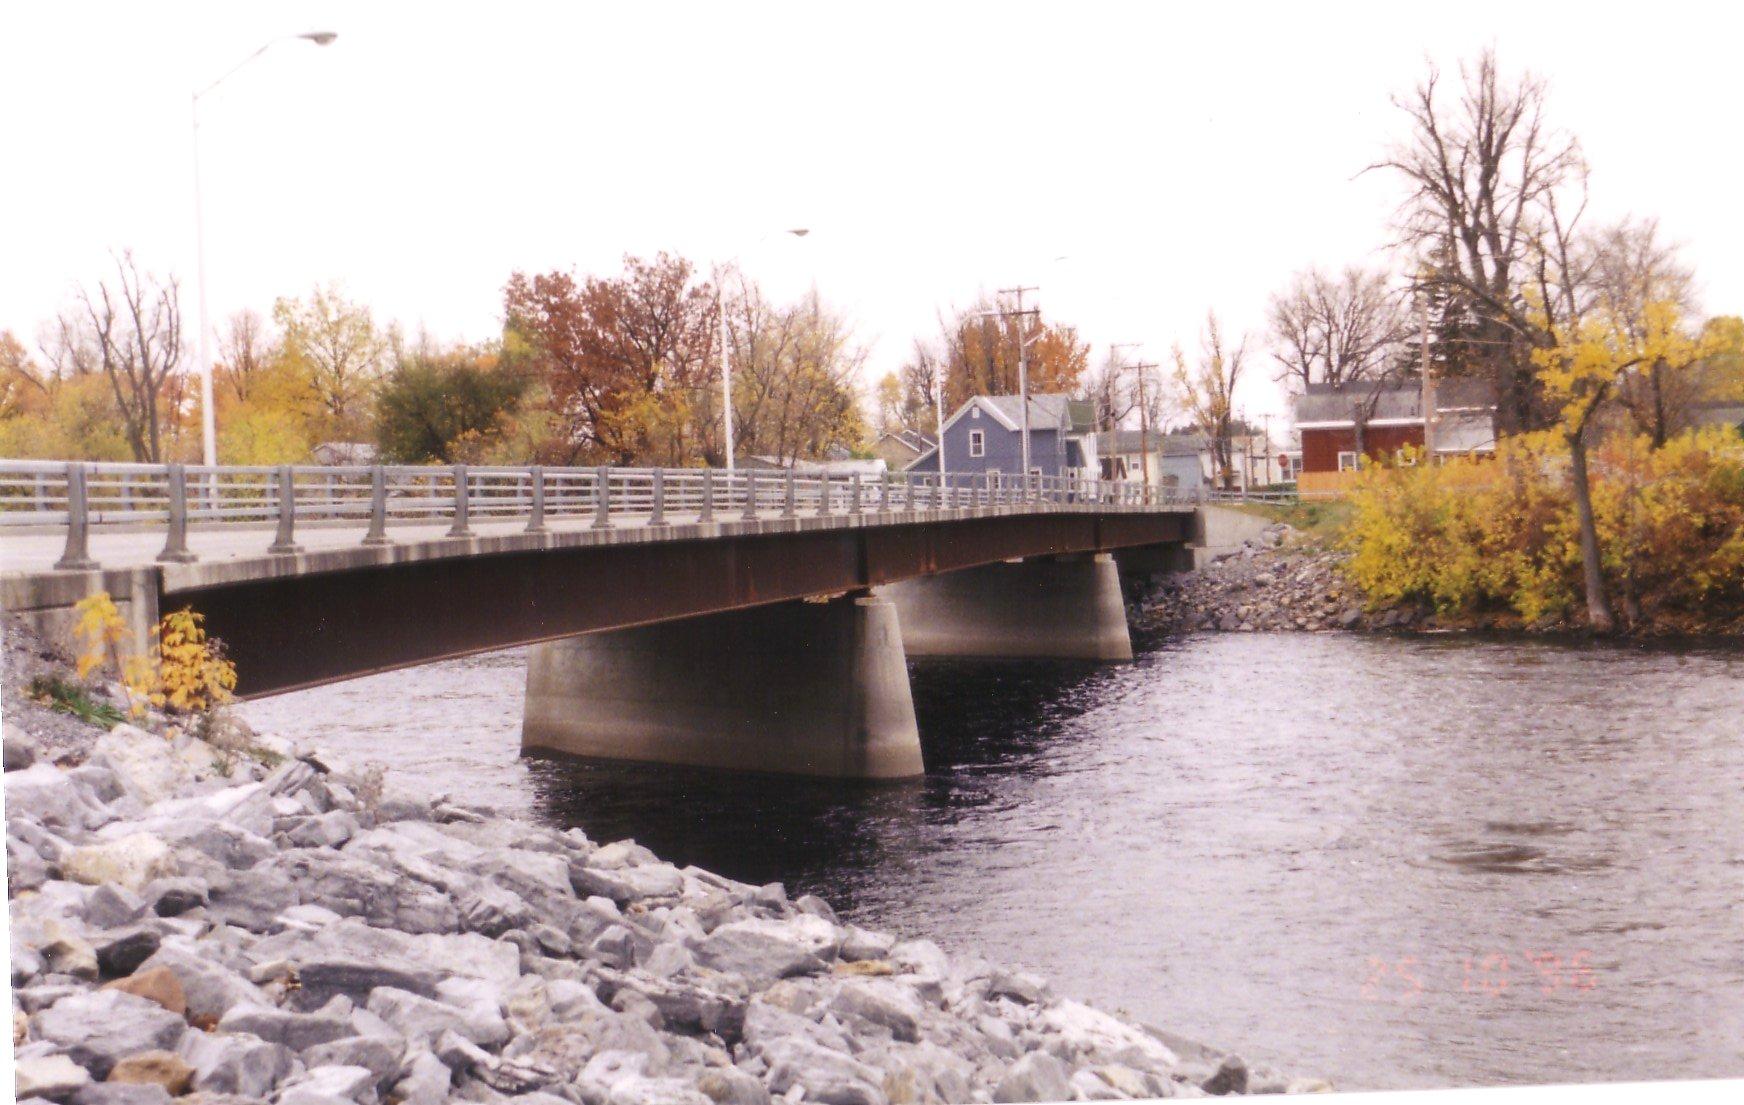 Photograph of the Black River At Watertown, NY (ARTN6)